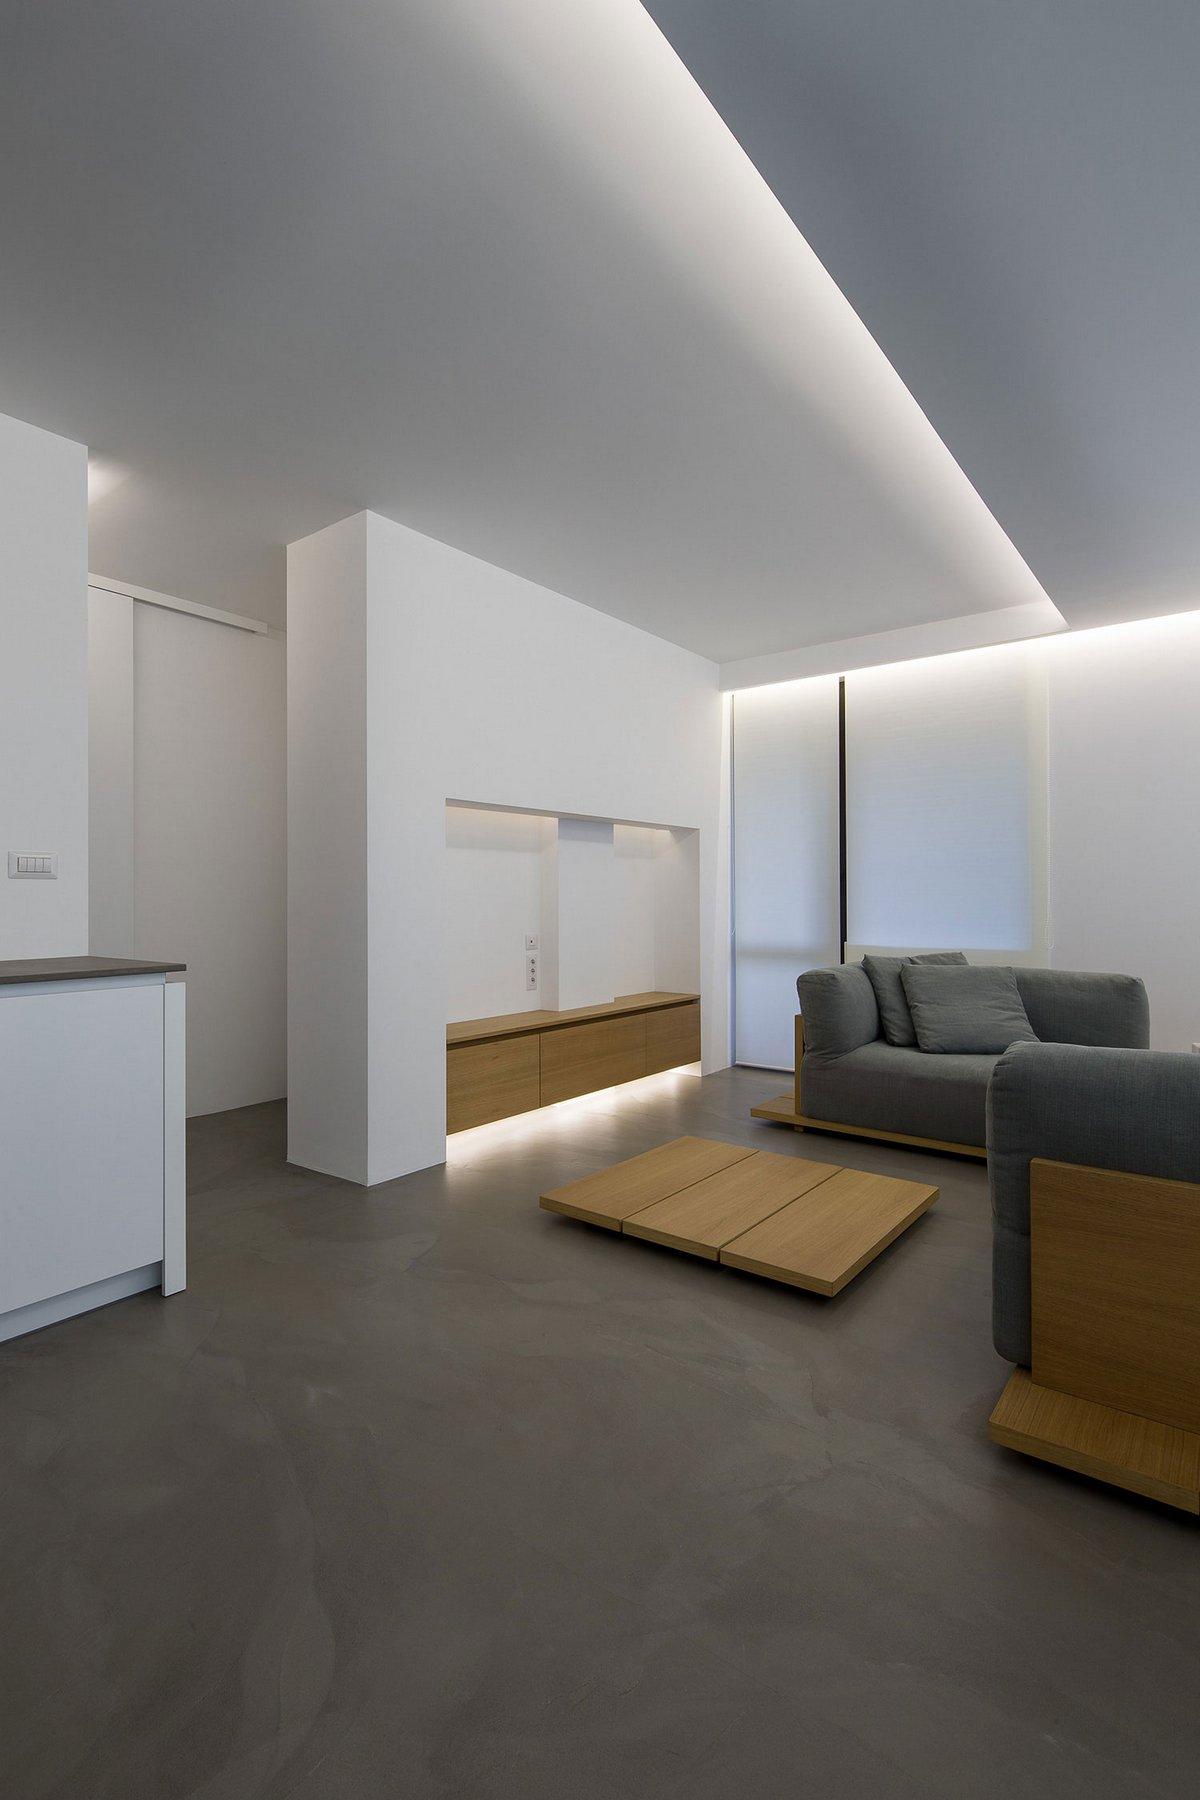 Elia Nedkov, Apartment P, Лозенец, квартиры в Лозенец, дизайн квартиры минимализм, варианты освещения в квартире фото, элитные квартиры в Болгарии